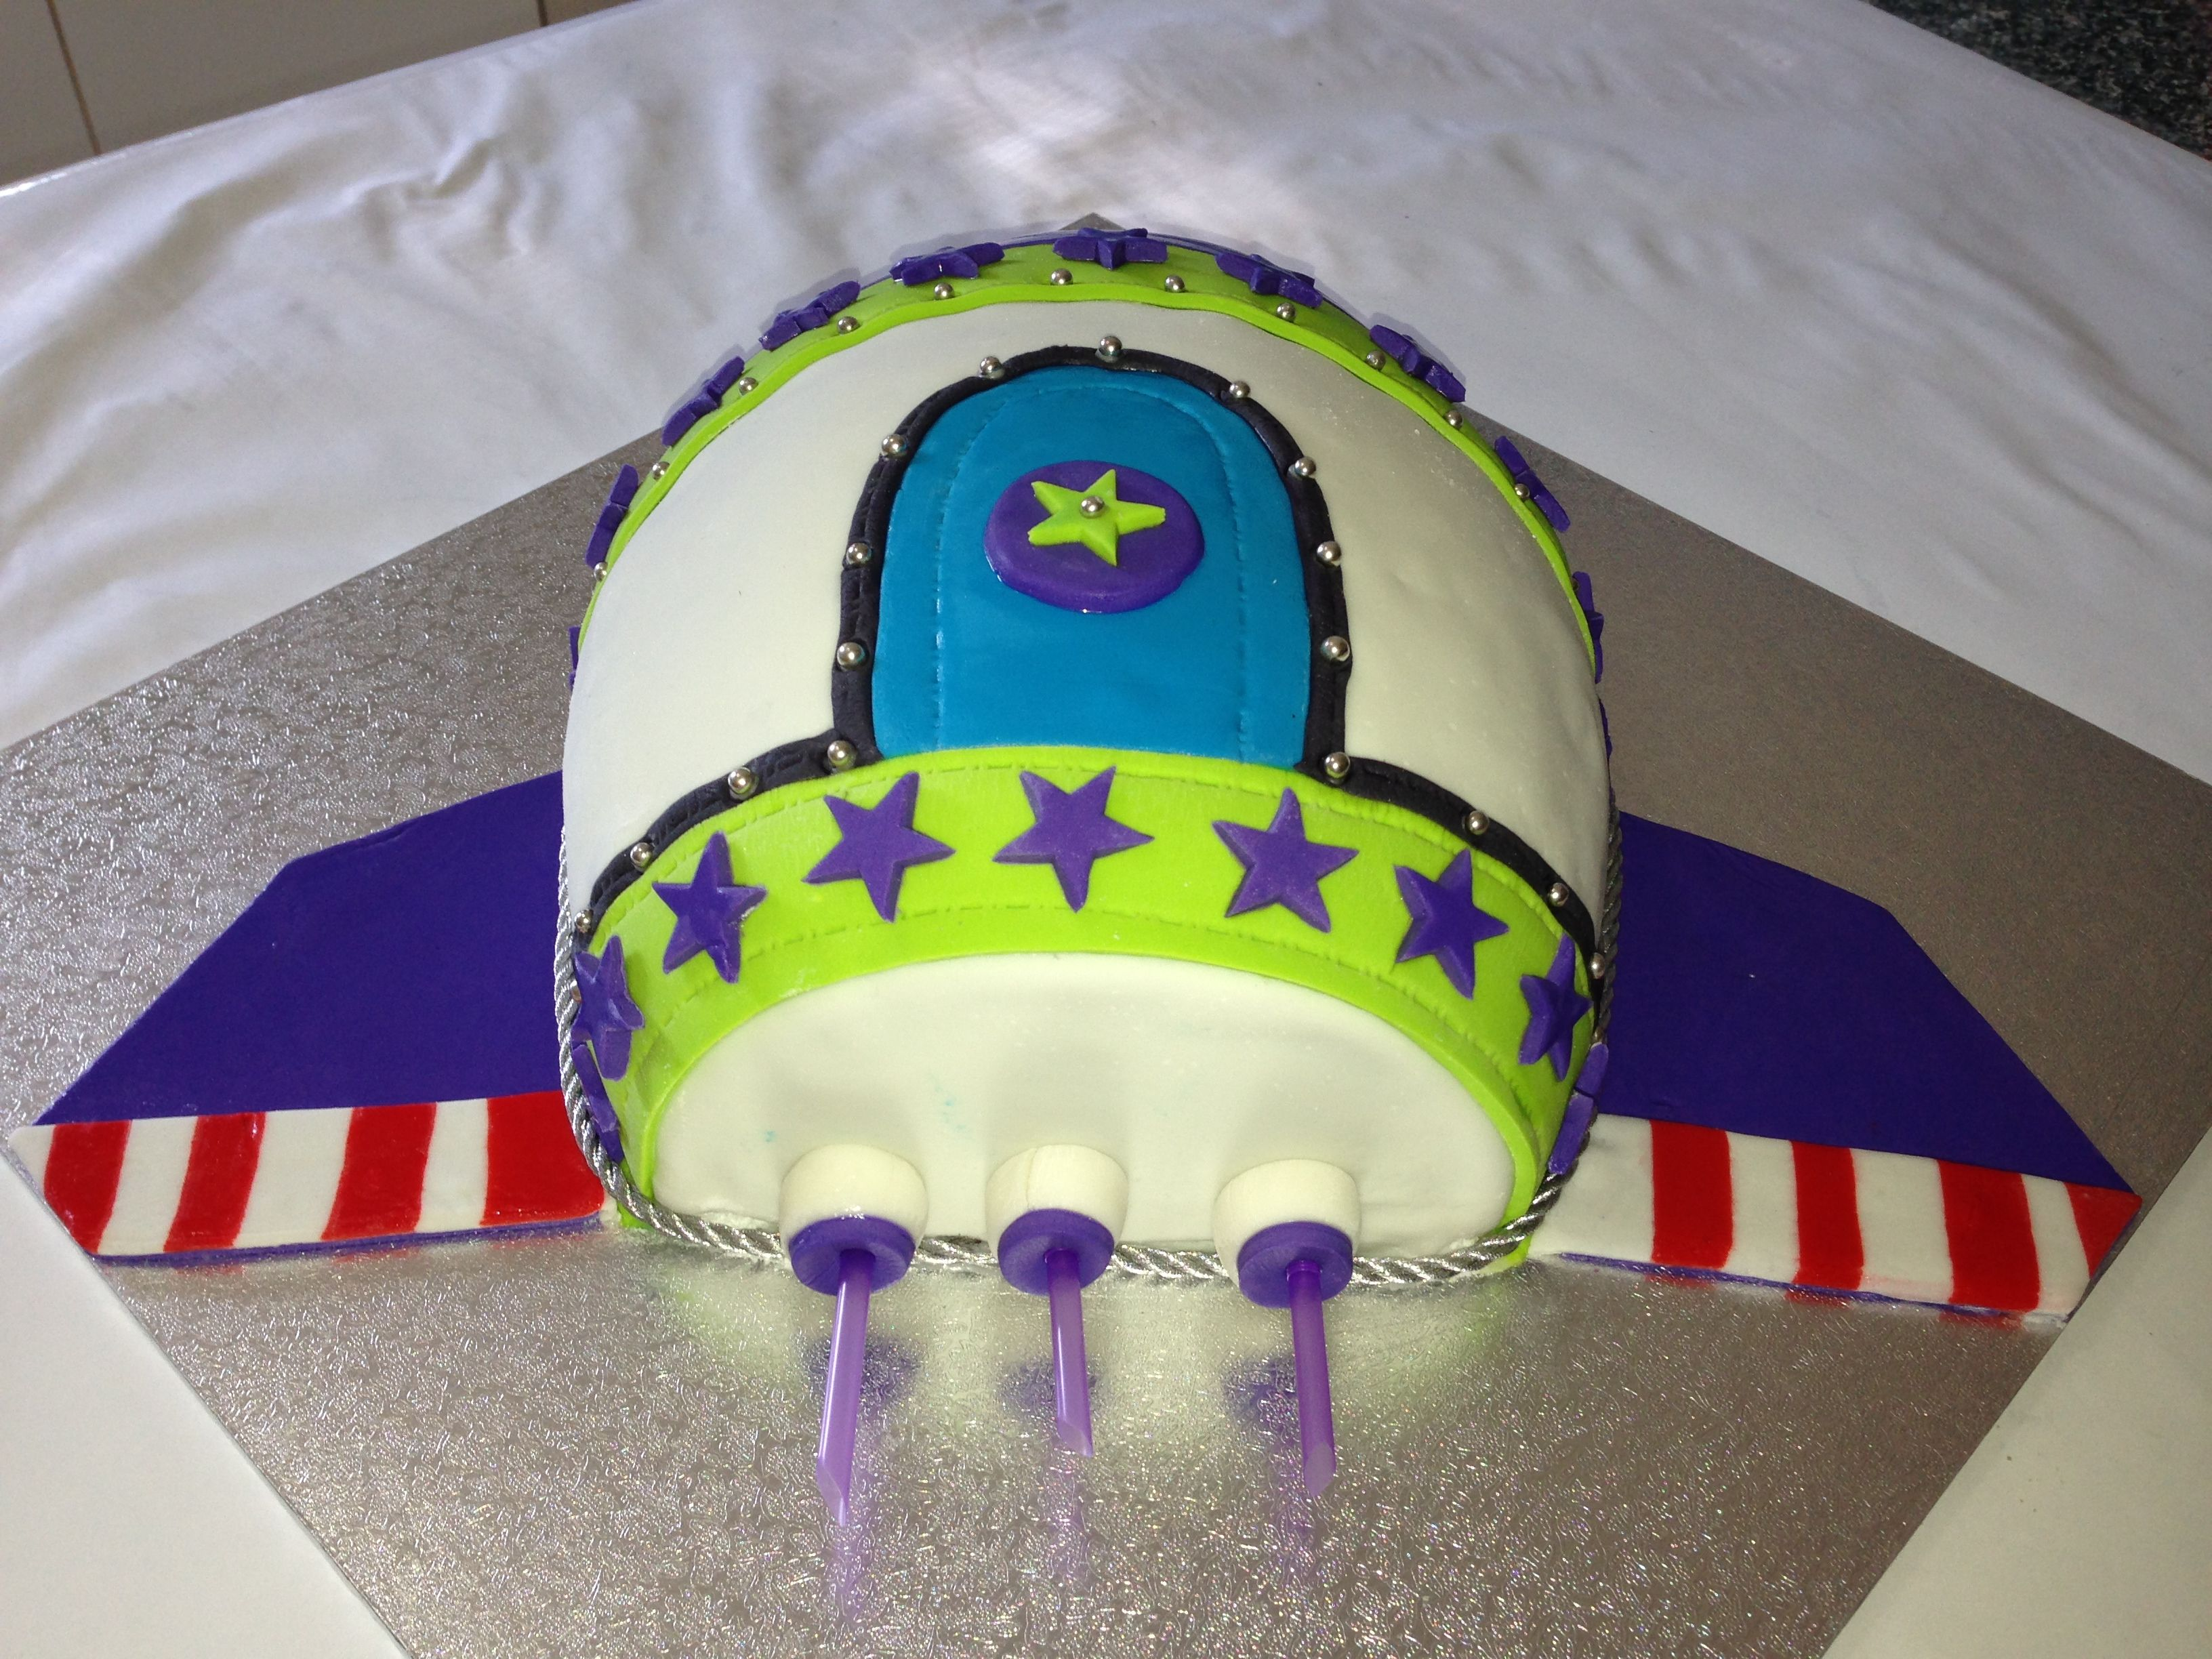 Buzz Lightyear Inspired Rocket Ship Cake Back View